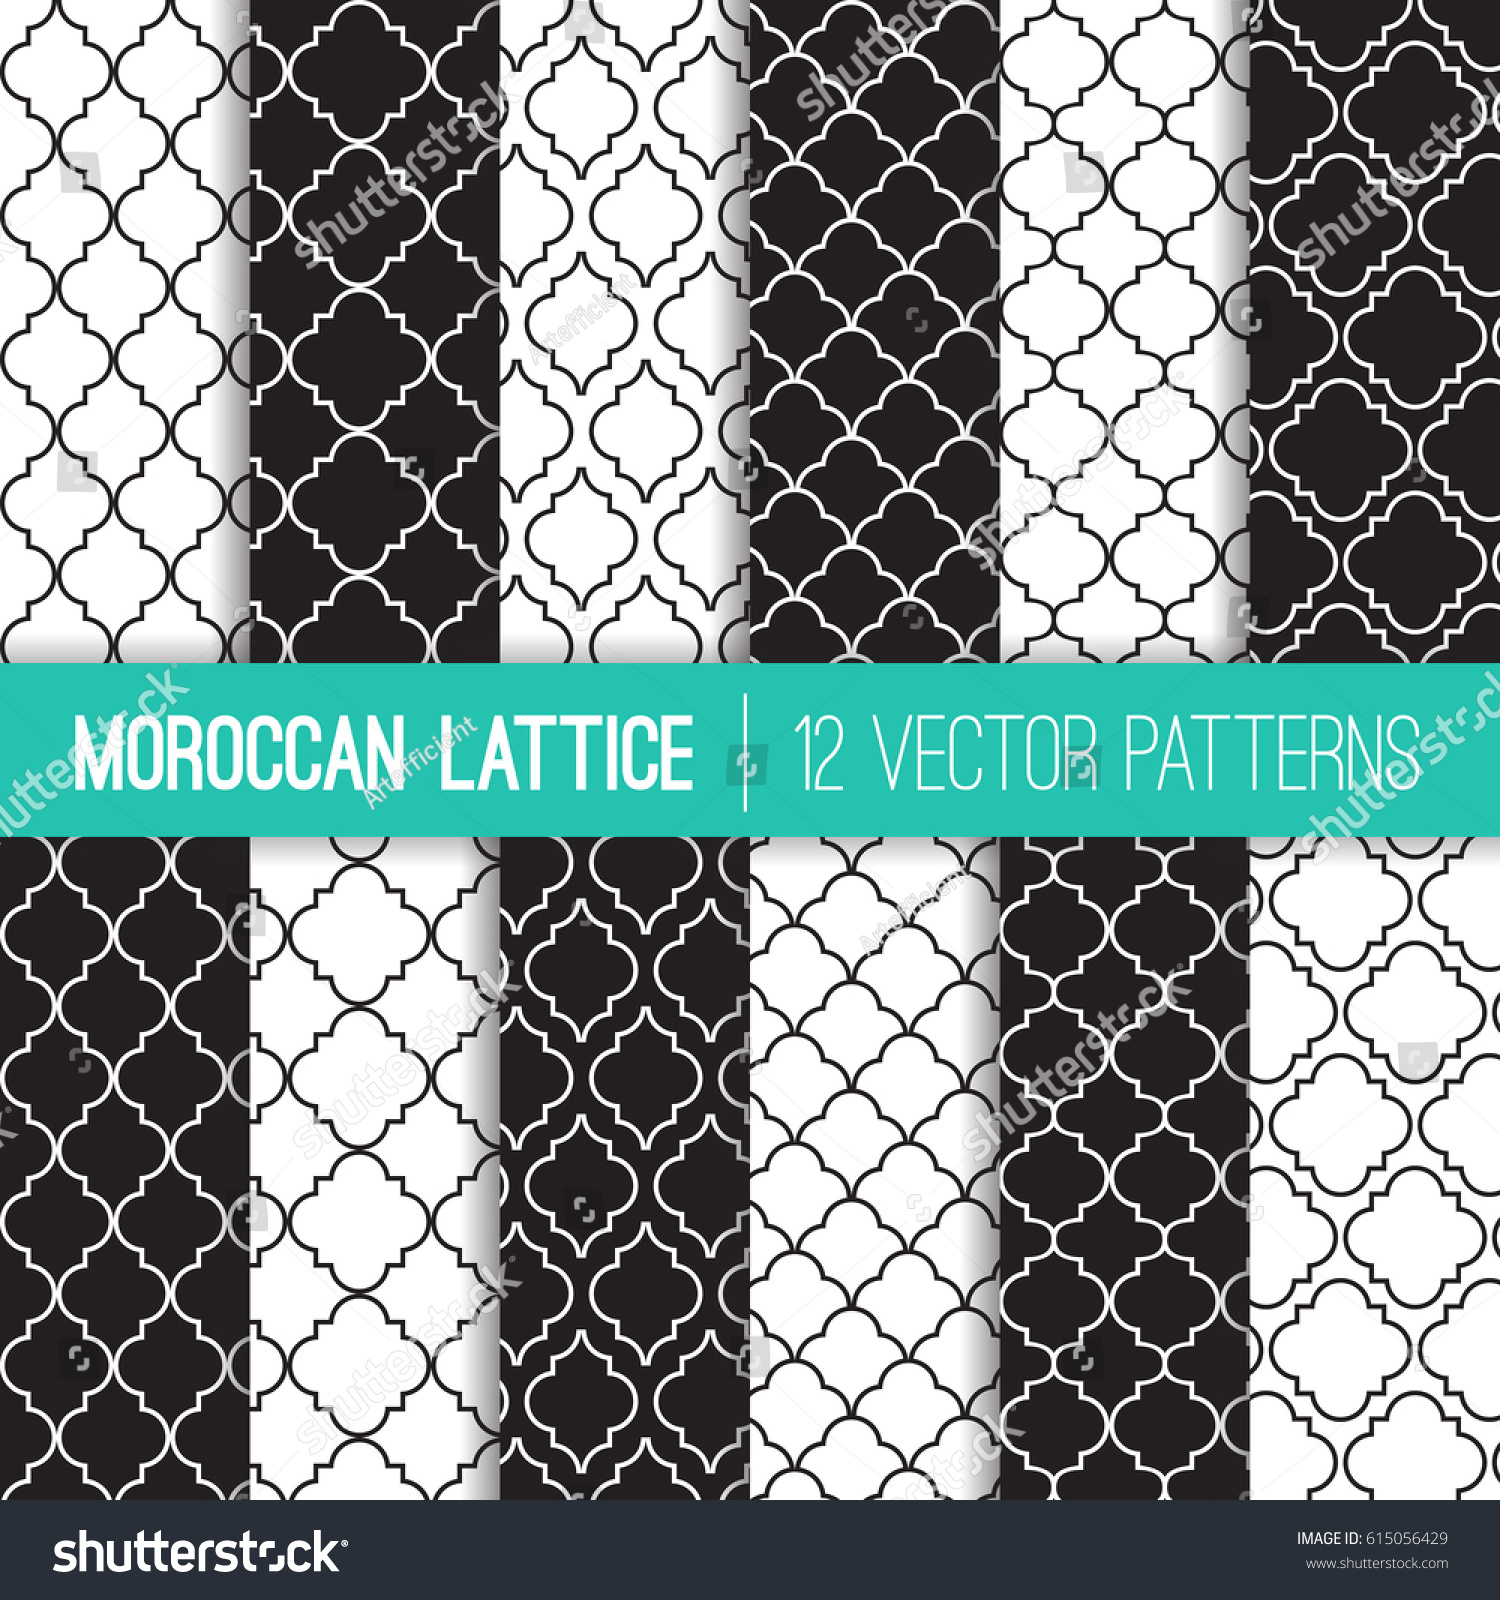 Black White Moroccan Lattice Vector Patterns Stock Vector (Royalty ...